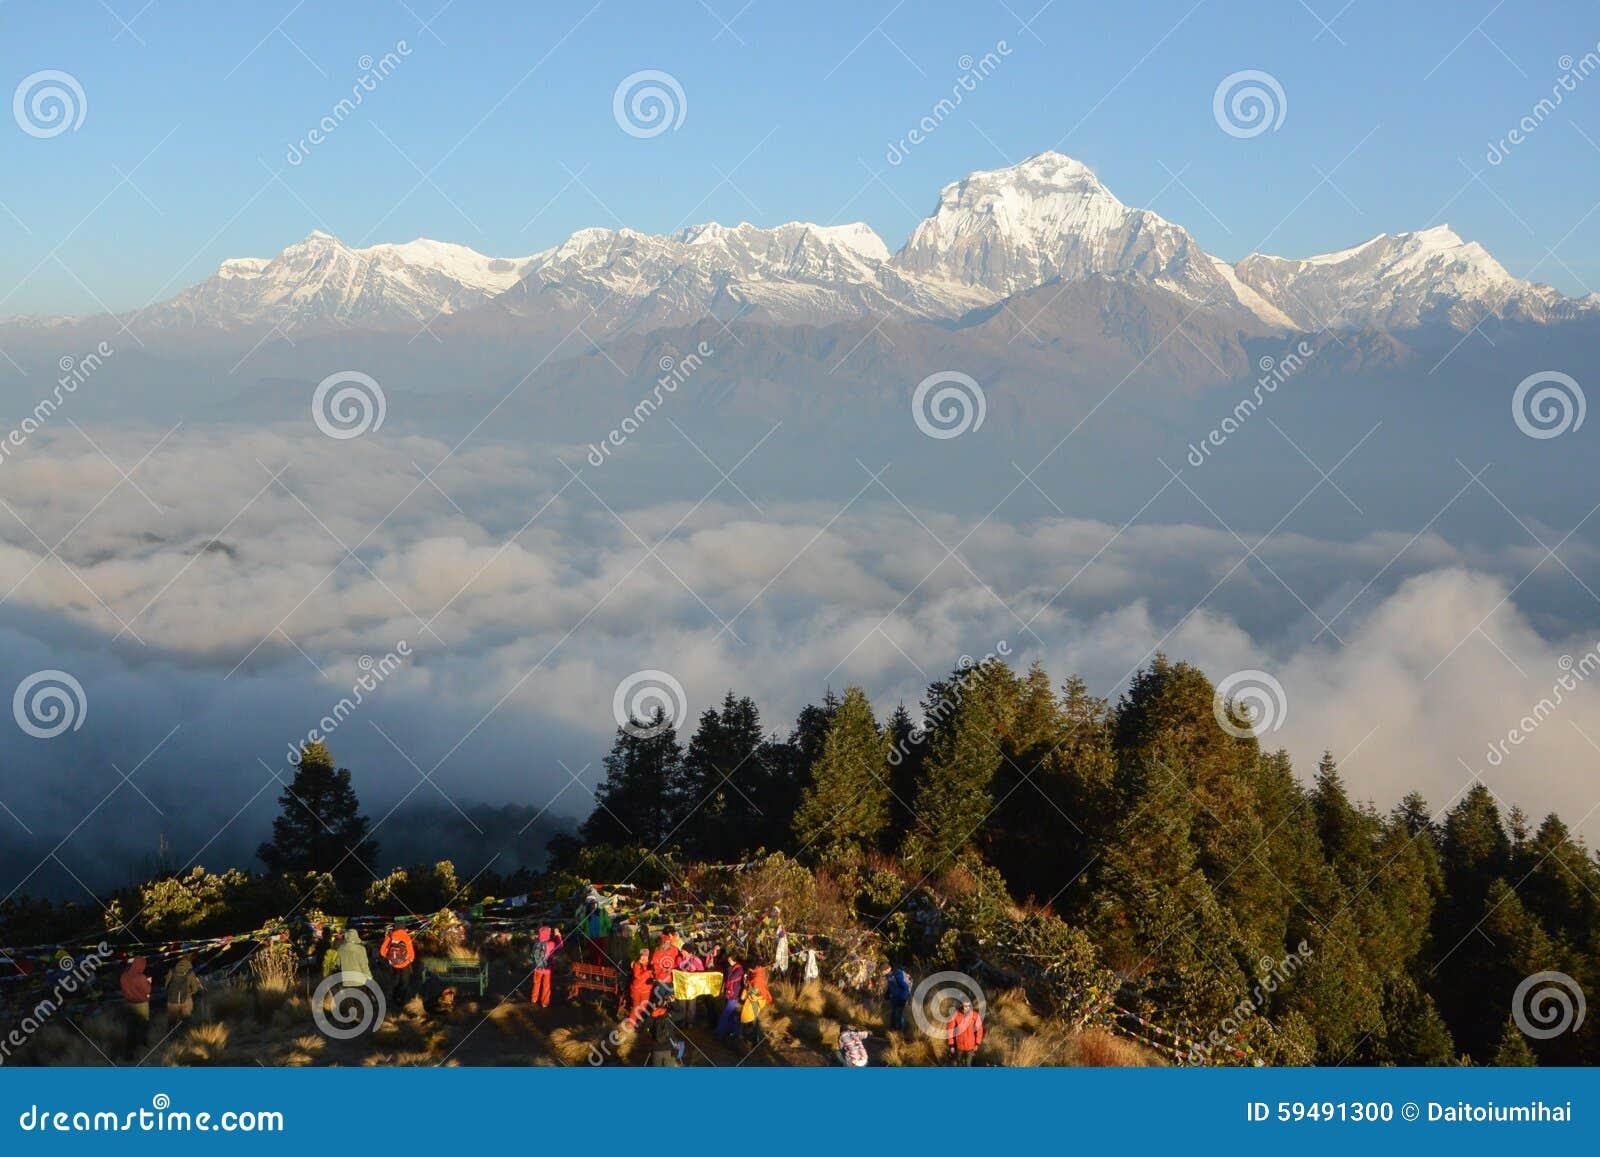 Dhaulagiri mountain on sunrise, Poon Hill, Himalaya, Nepal